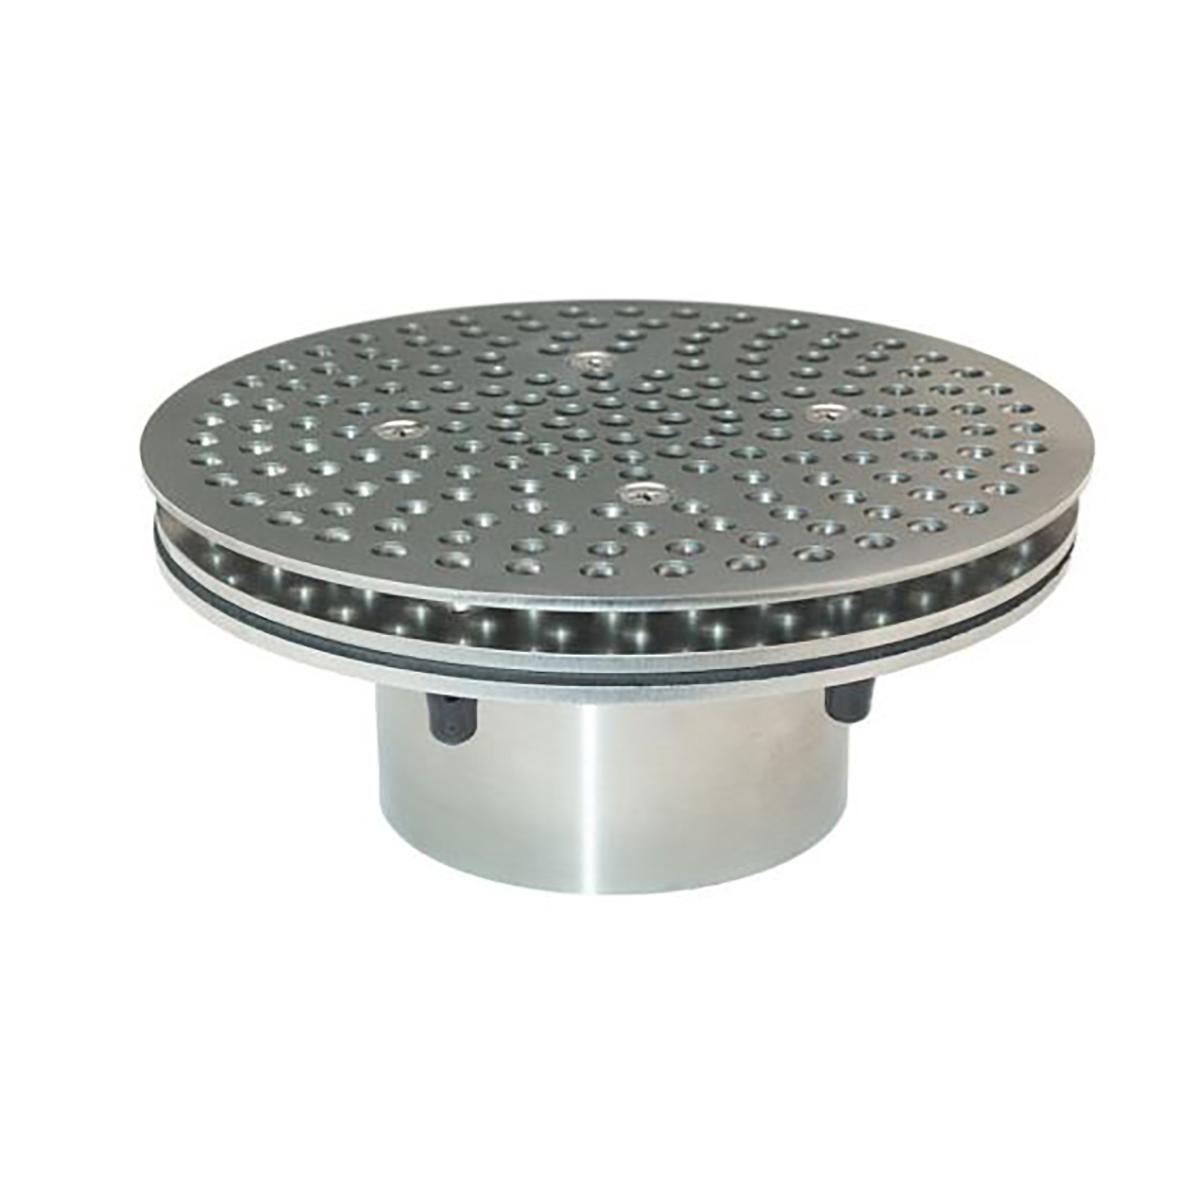 Smart Bodenablauf Universal VBA 100, inkl. Siebaufsatz und Gummidichtung, VA-Edelstahl Smart Bodenablauf Universal VBA 100, inkl. Siebaufsatz und Gummidichtung, VA-Edelstahl